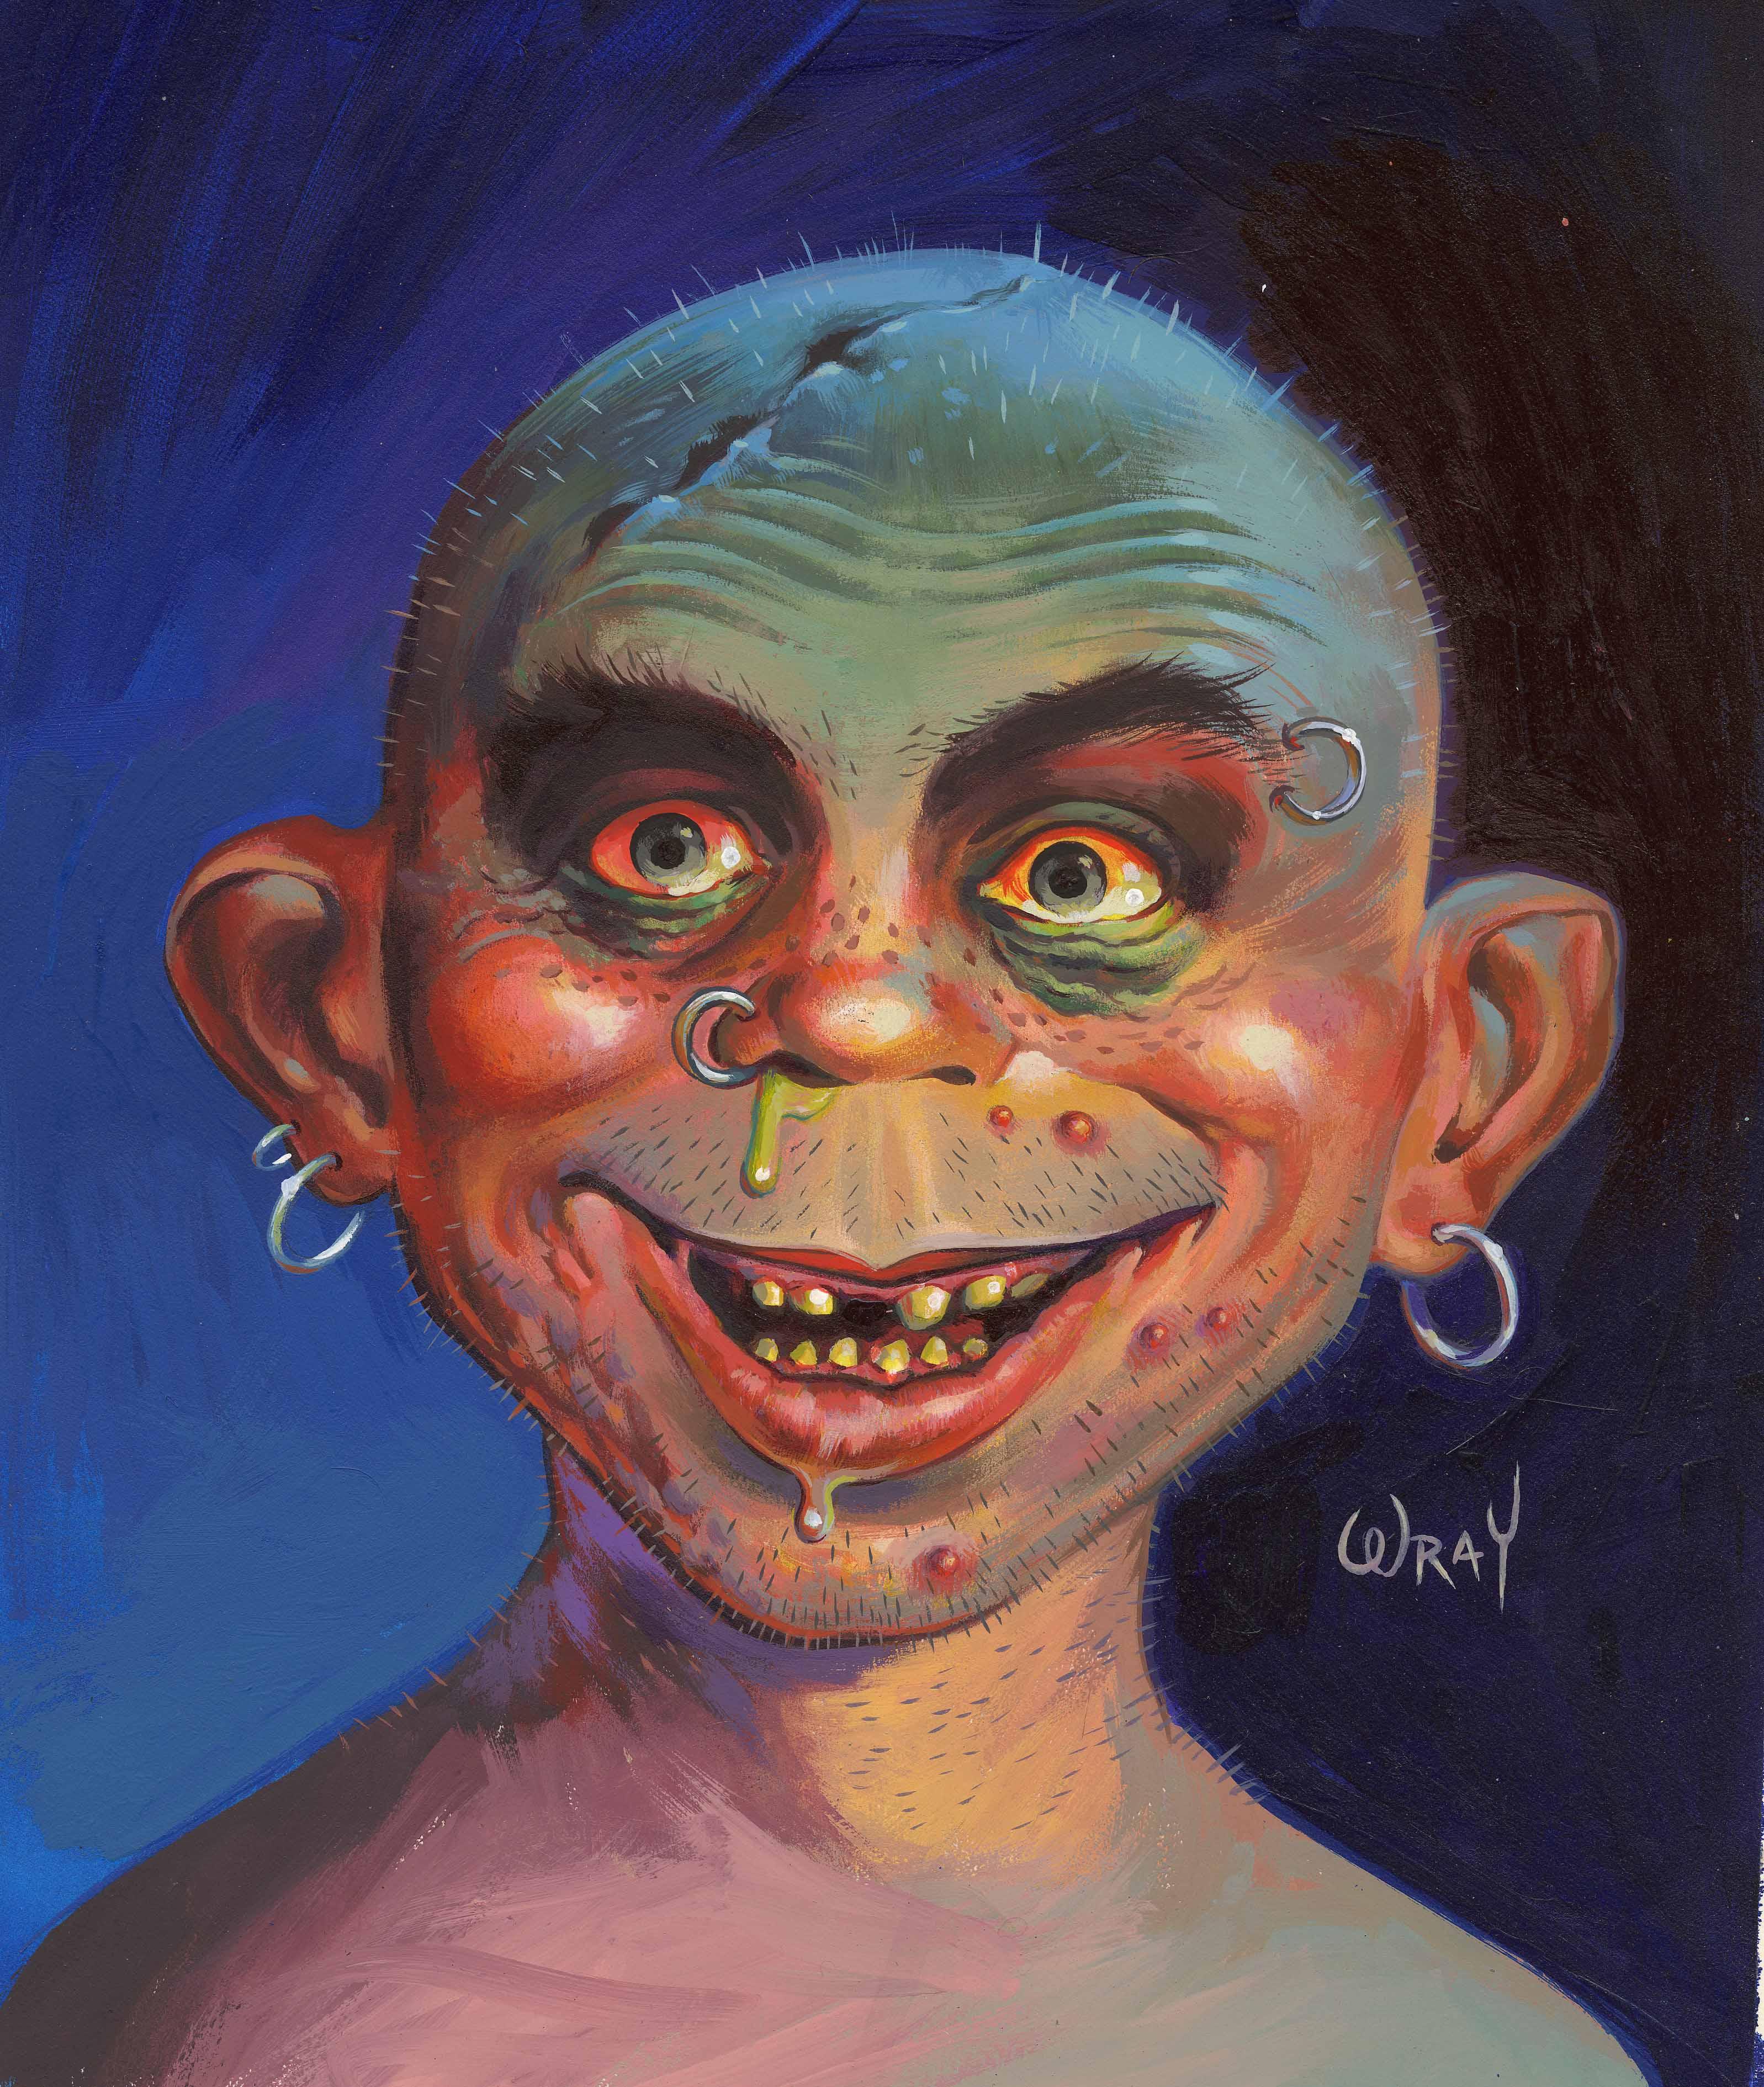 Ugly wallpapers for desktop wallpapersafari - Ugly face wallpaper ...